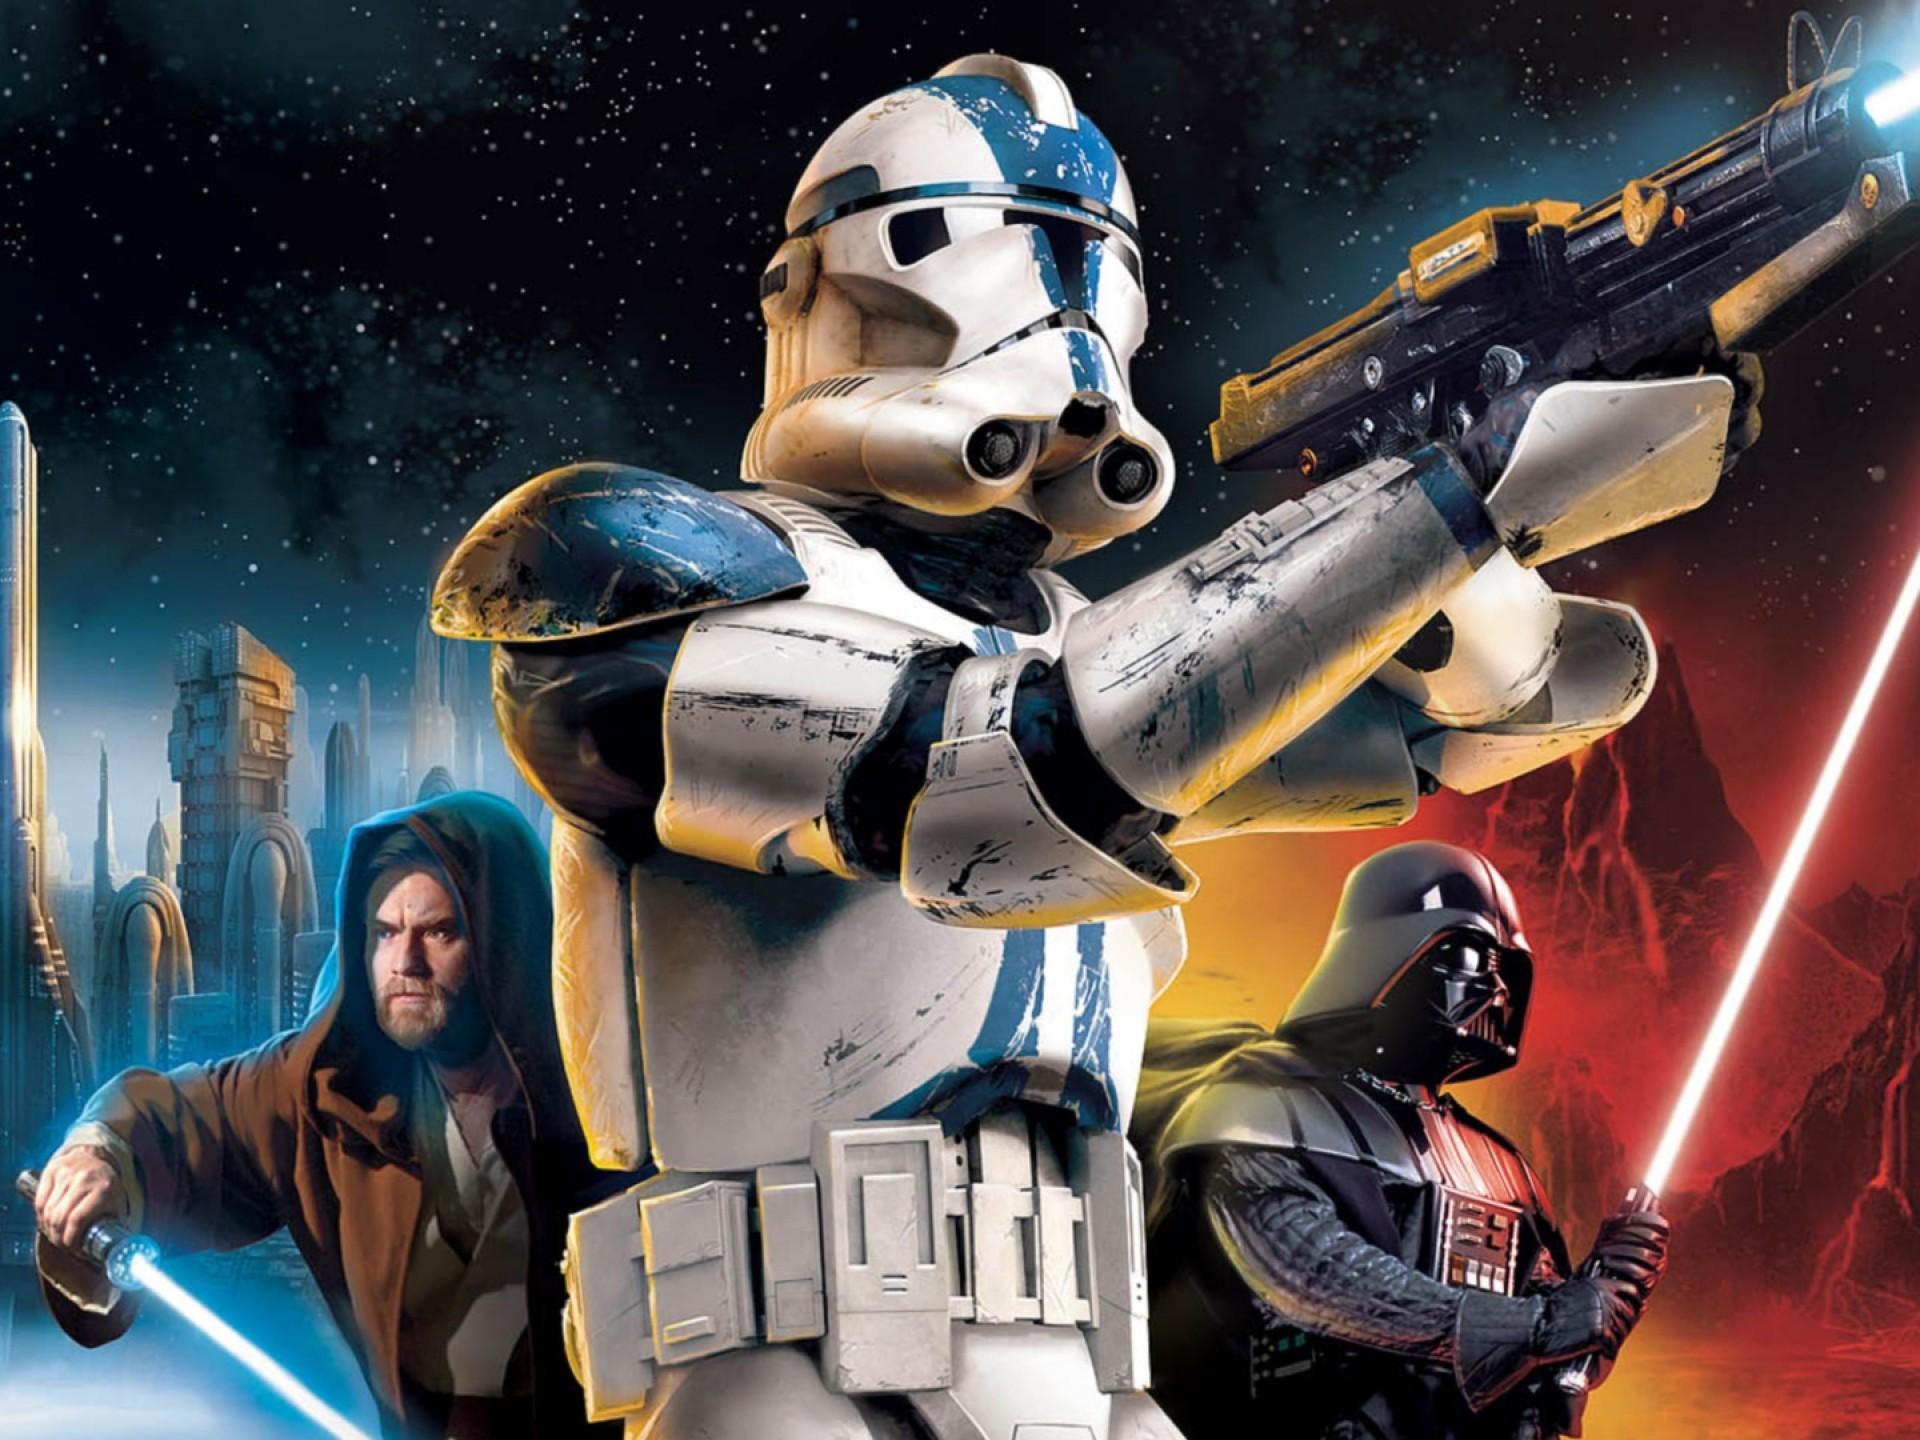 Star Wars Battlefront 1 1920x1440 Wallpaper Teahub Io